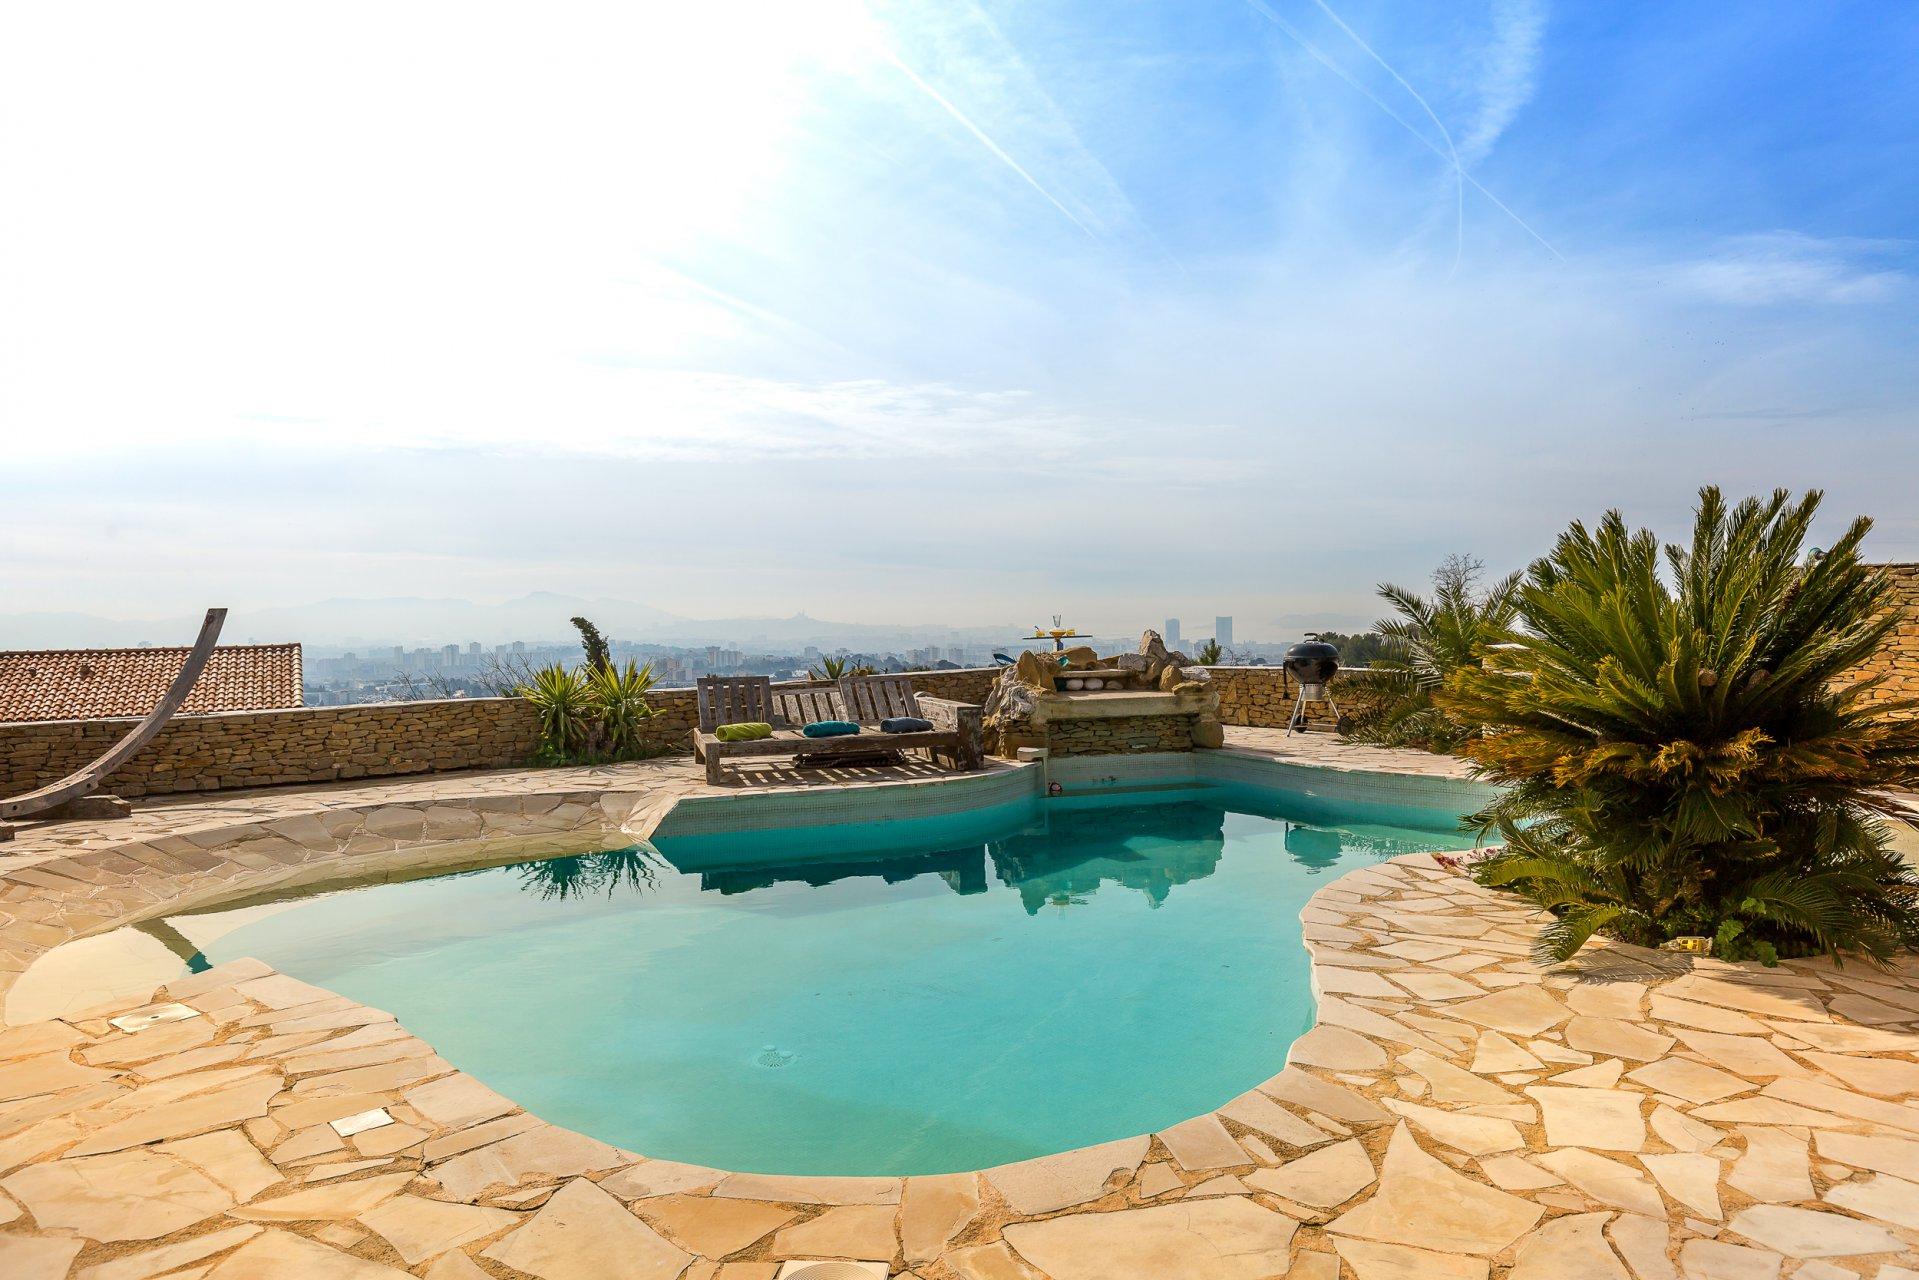 marseille location villa provence bord de mer avec piscine privee et vue mer